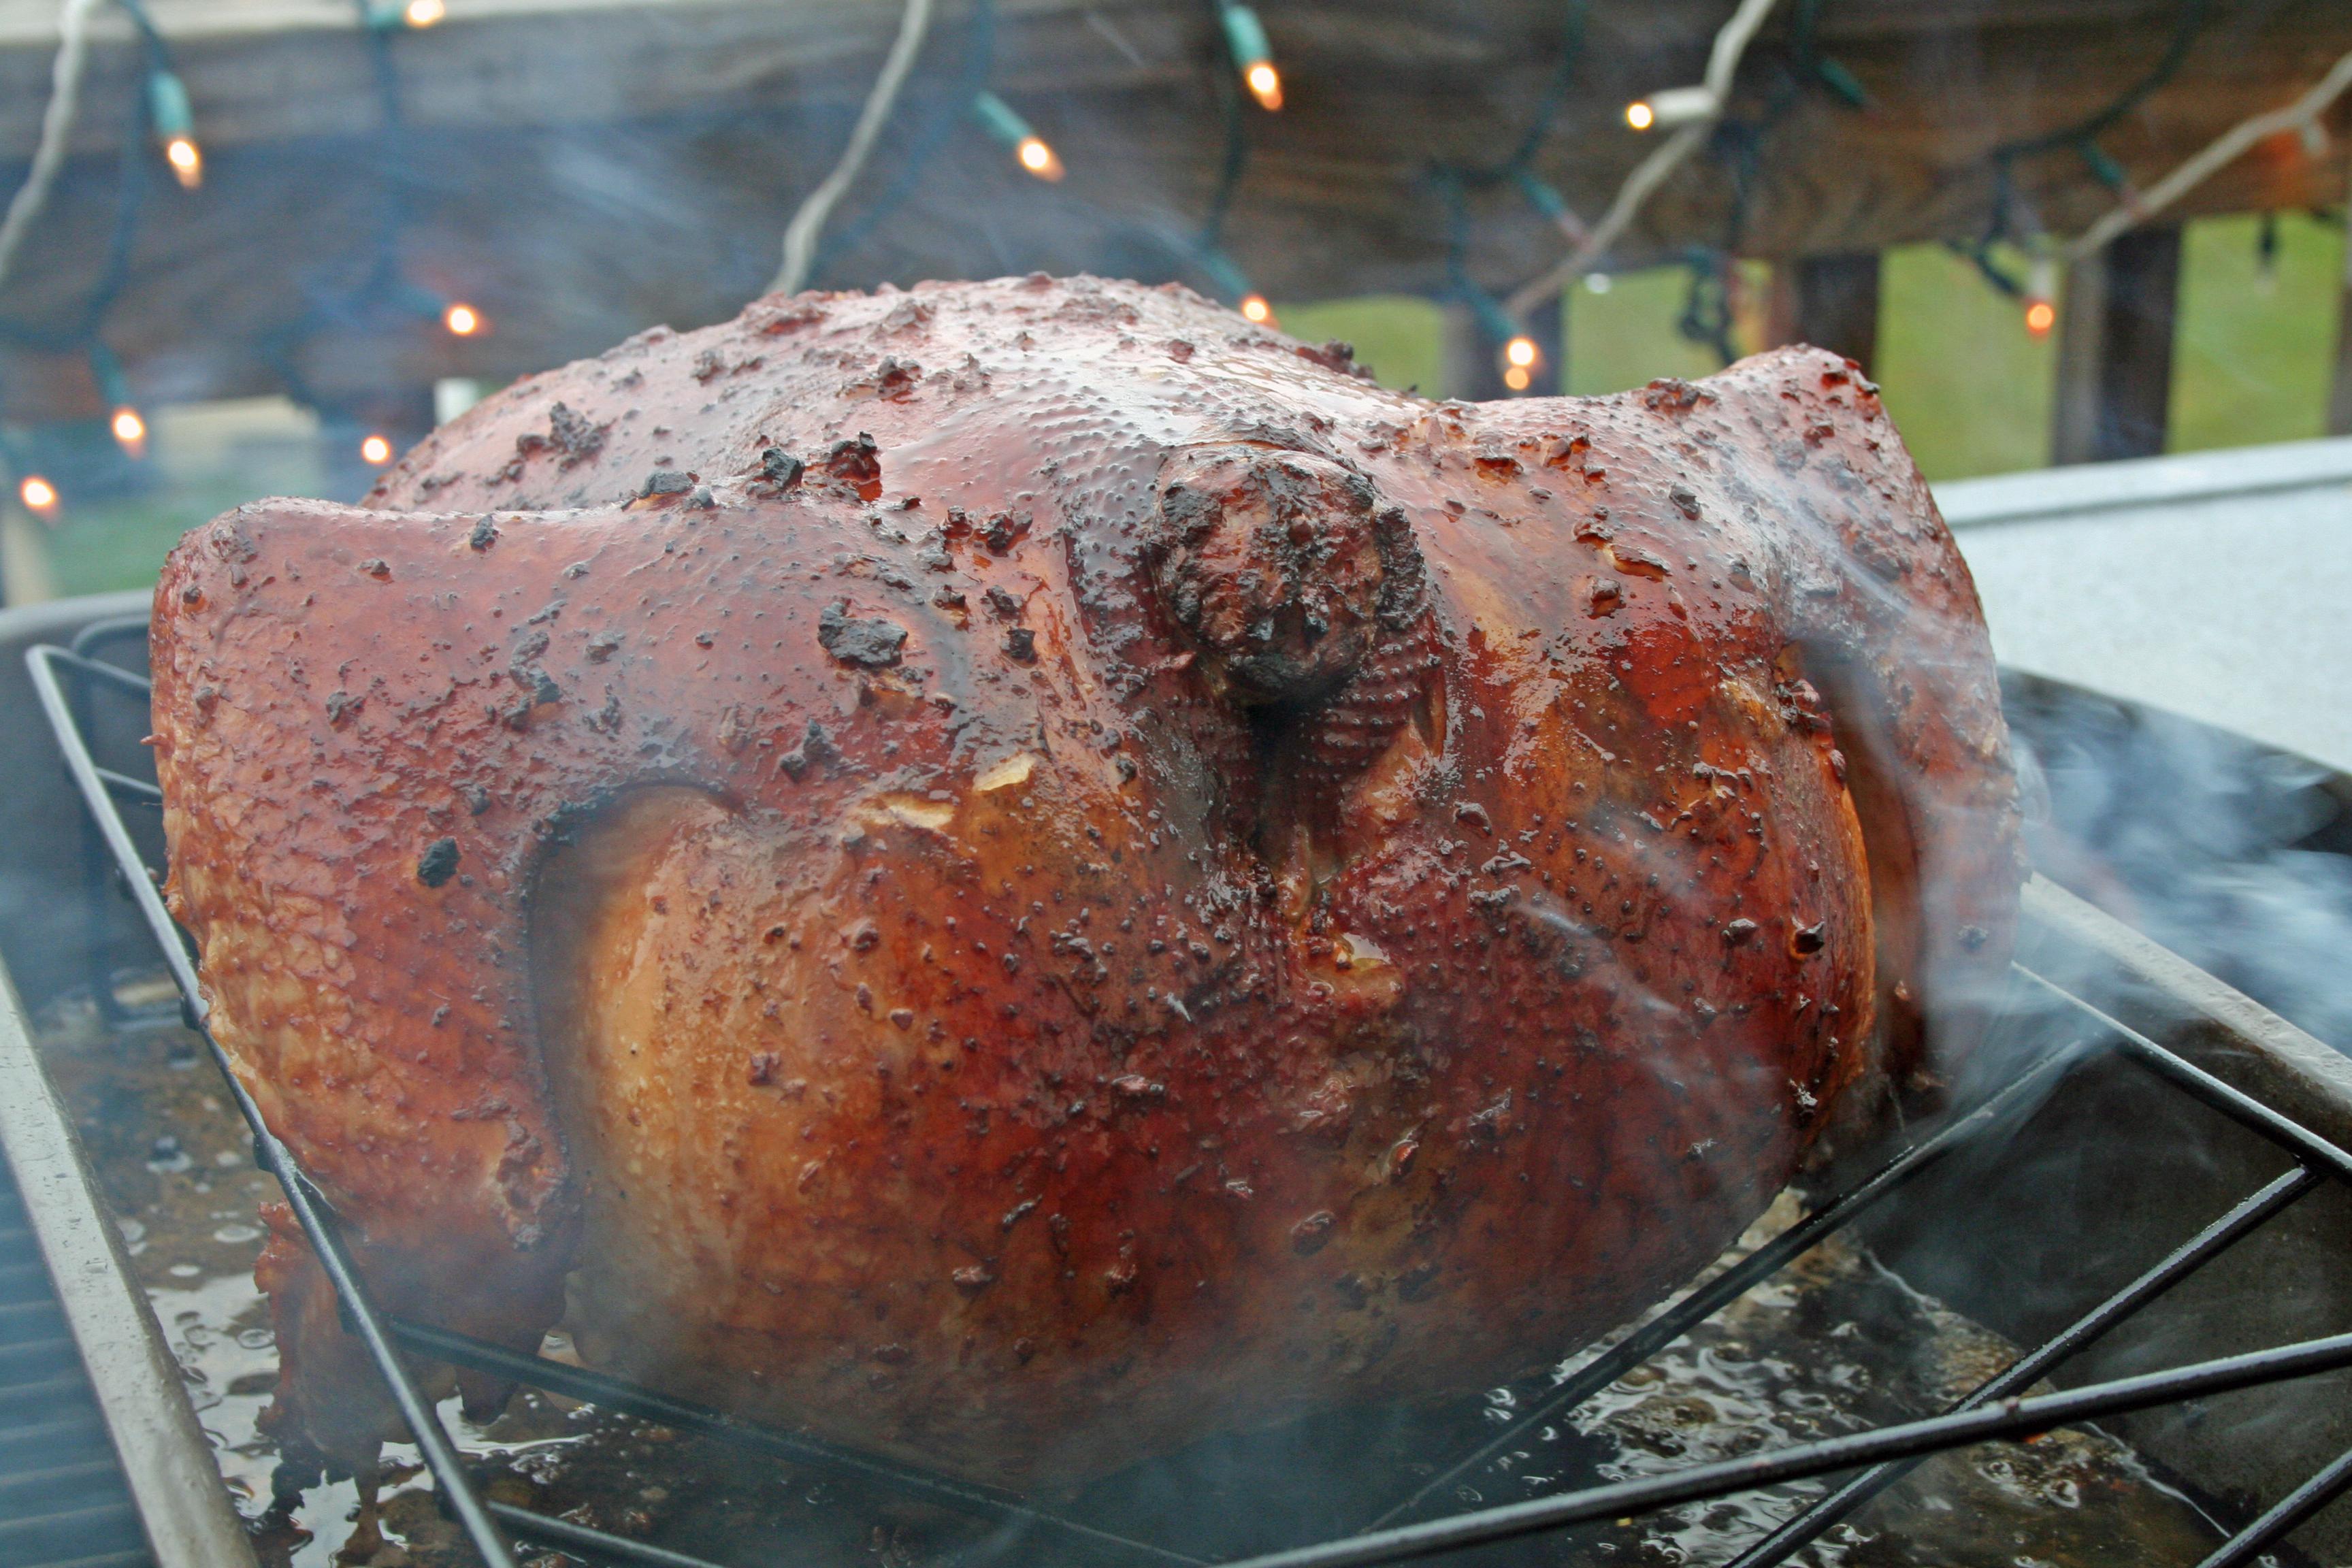 Cooking Turkey: A Smoked Turkey Recipe